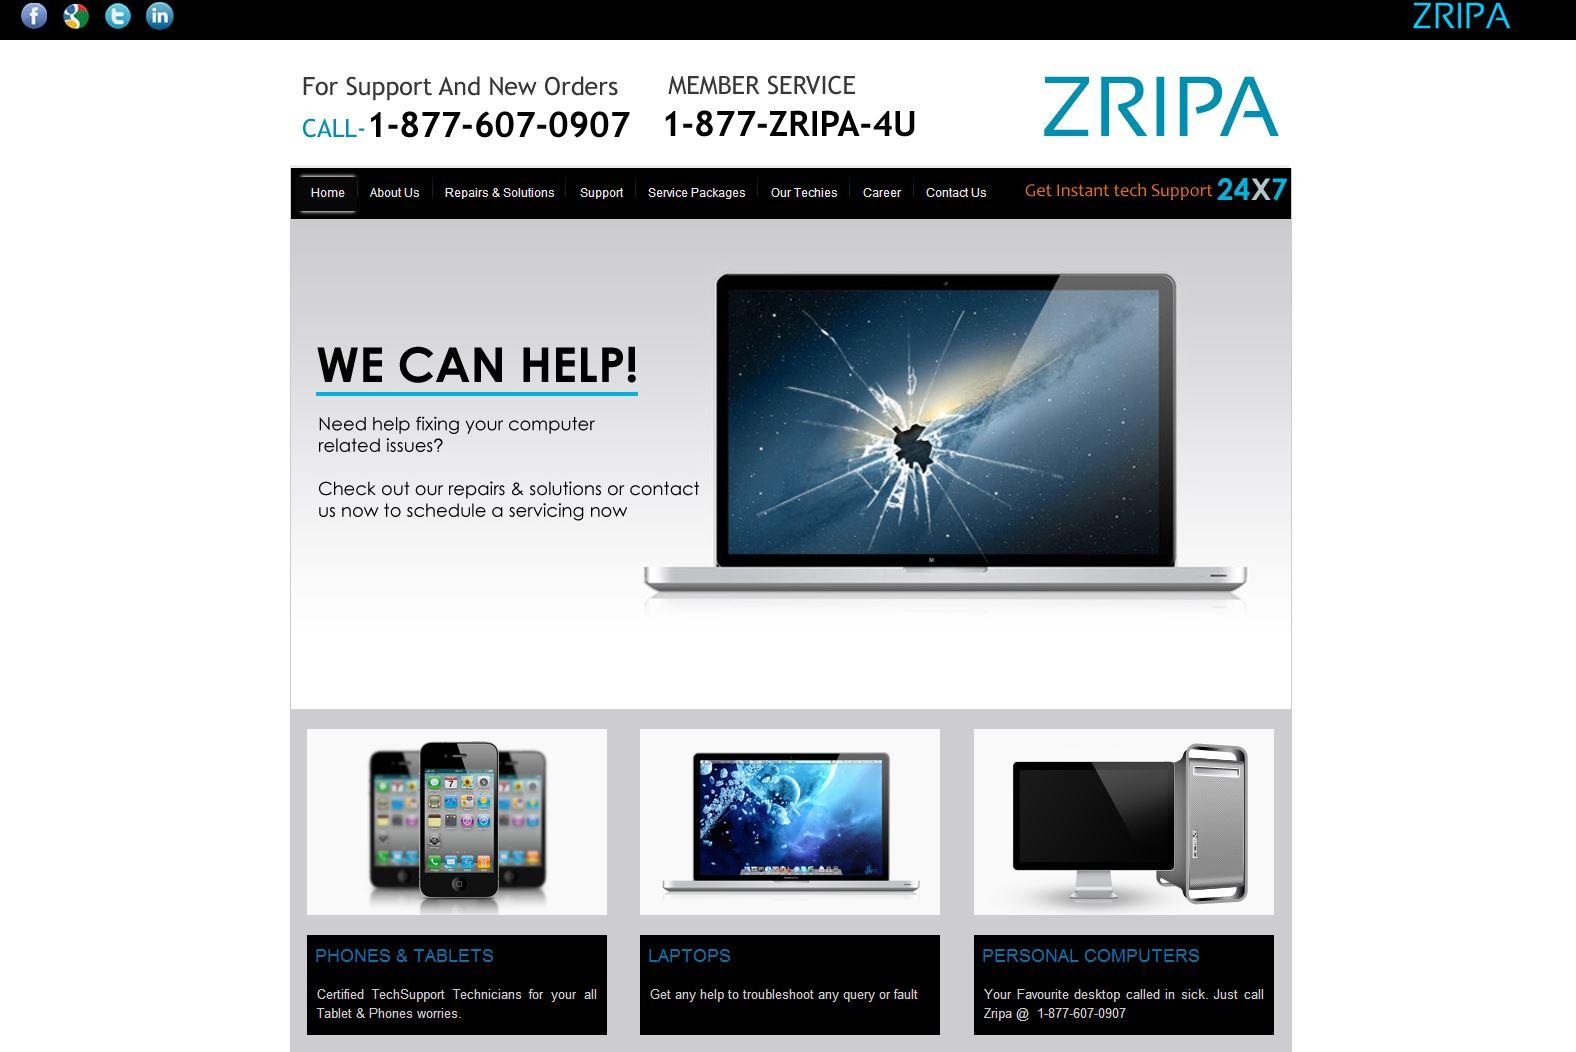 ZRIPA Technical